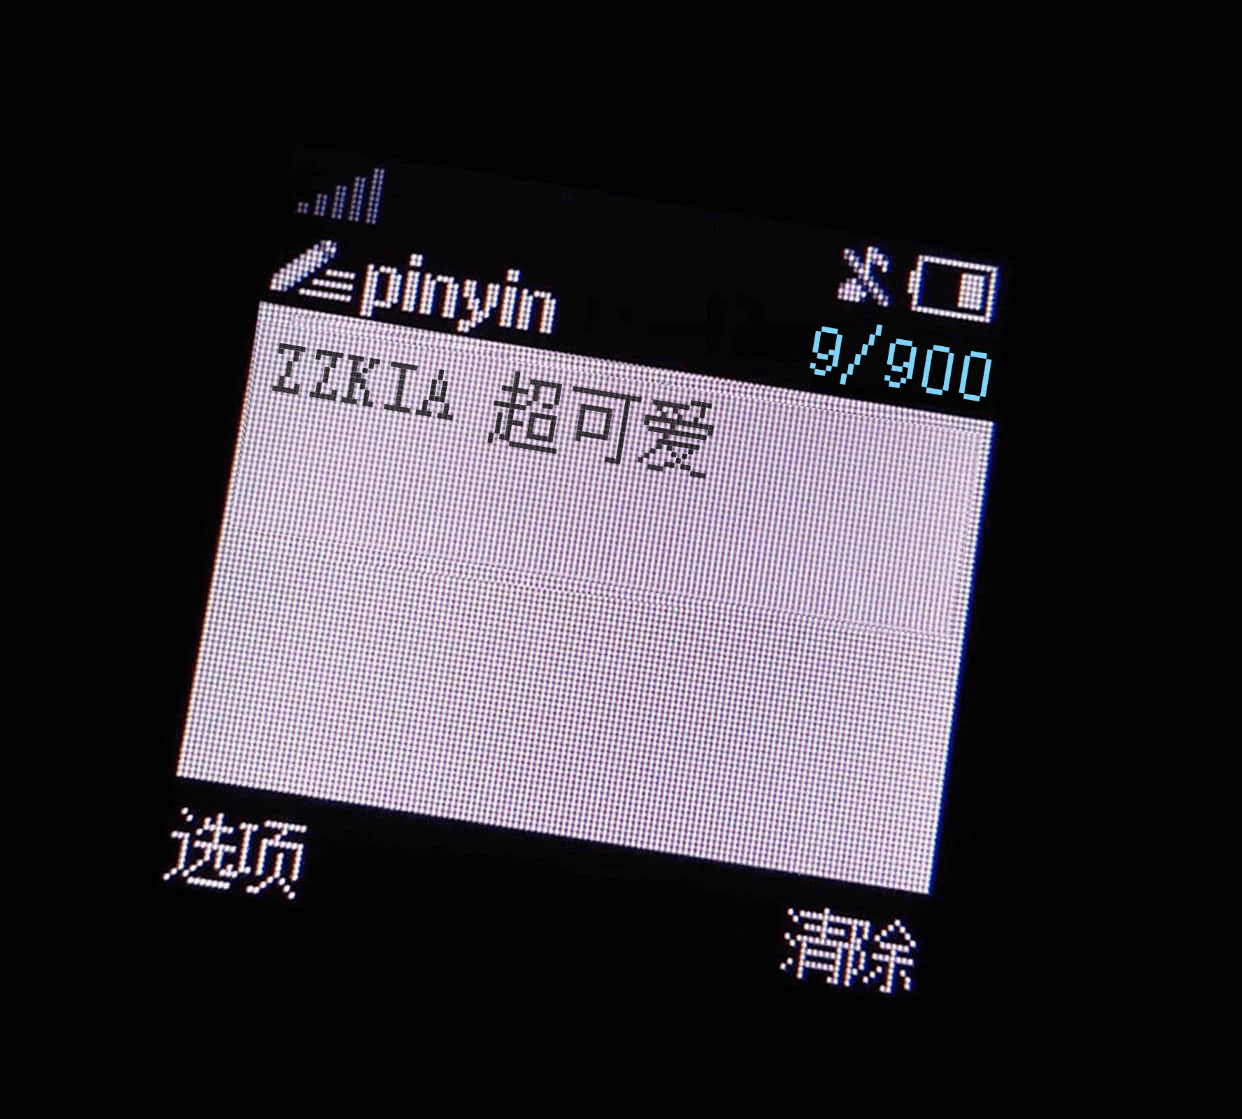 ZZKIA: 诺基亚短信图片生成器